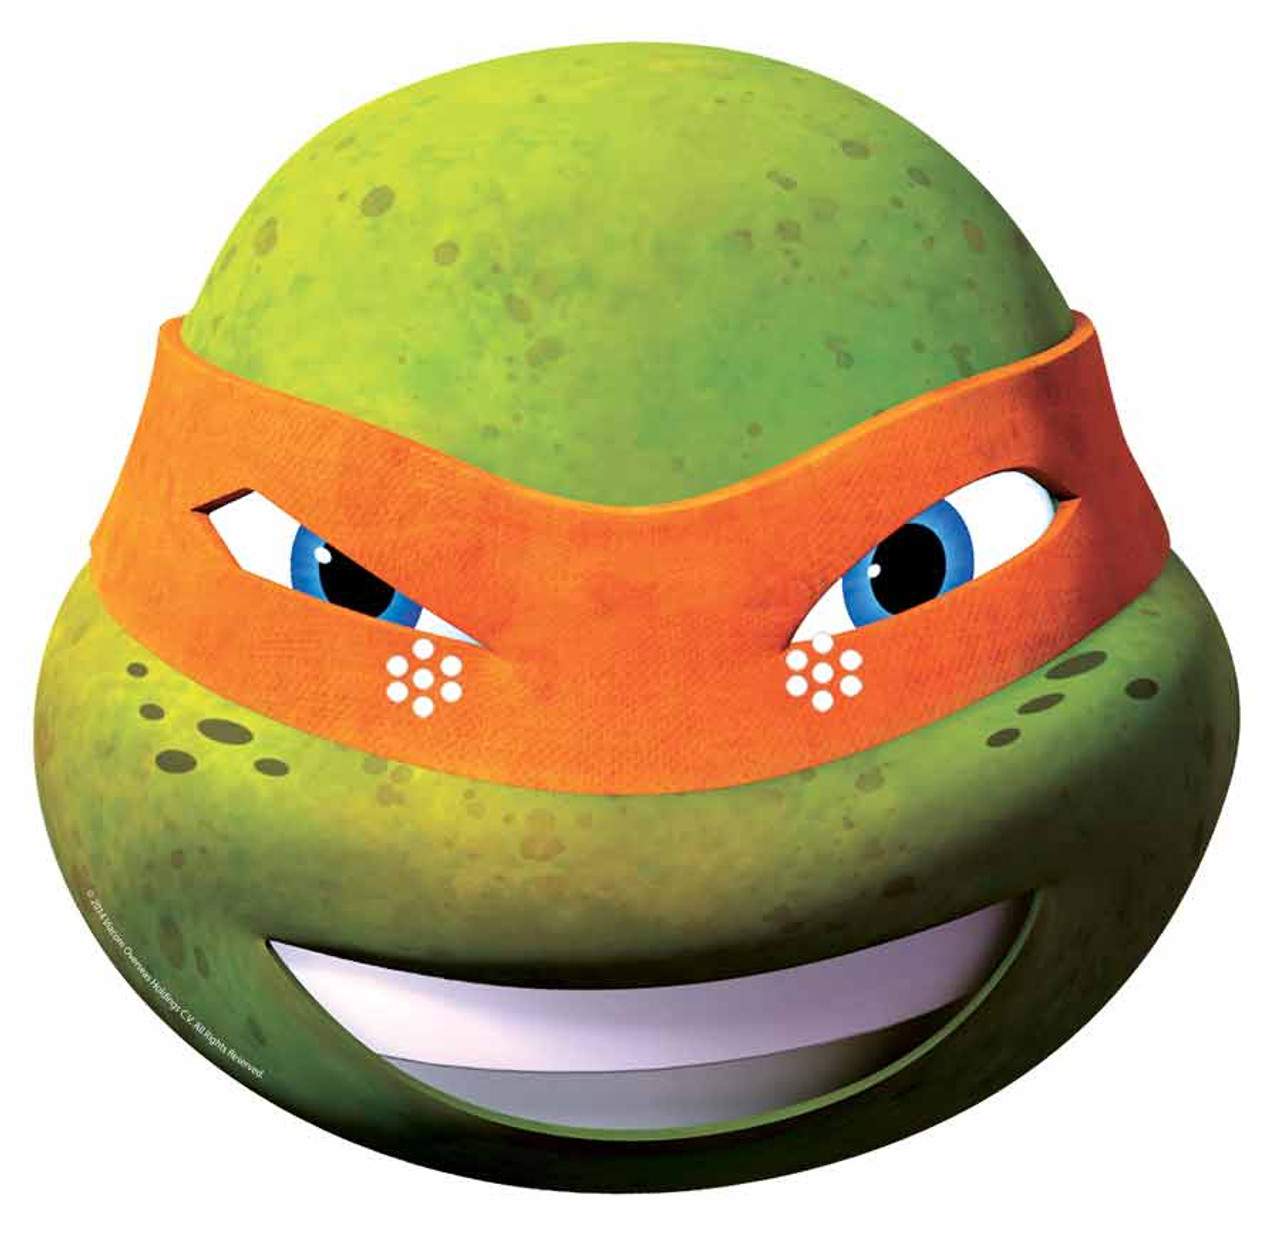 Donatello Teenage Mutant Ninja Turtles Official New 2015 Single Card Face Mask